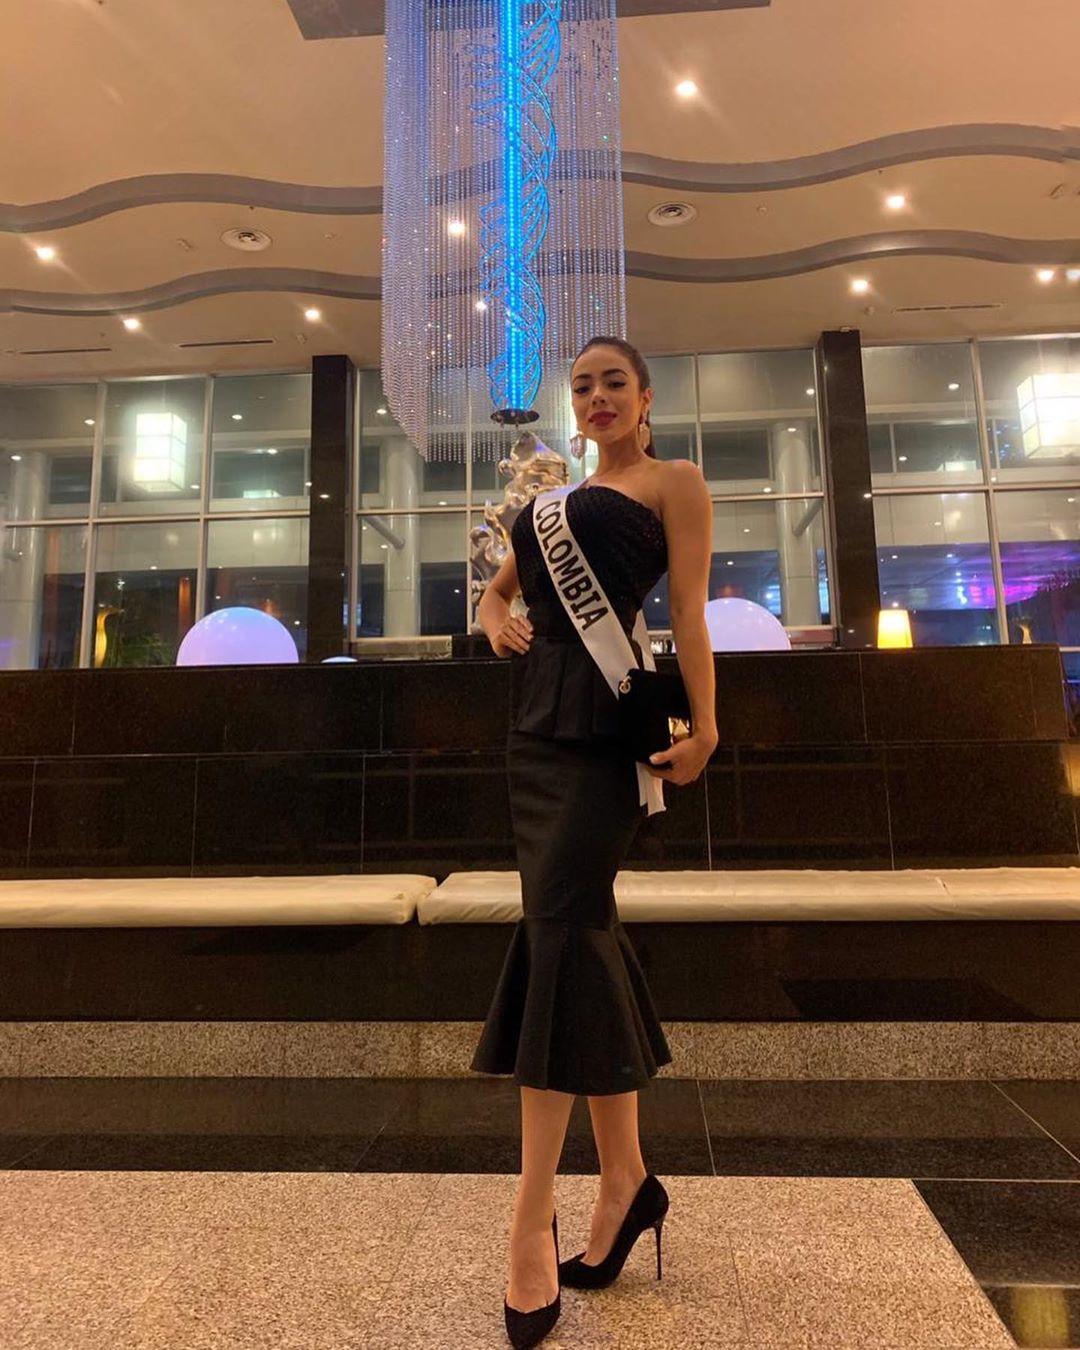 gina aguirre, virreyna de miss latinoamerica 2019. - Página 4 70920510